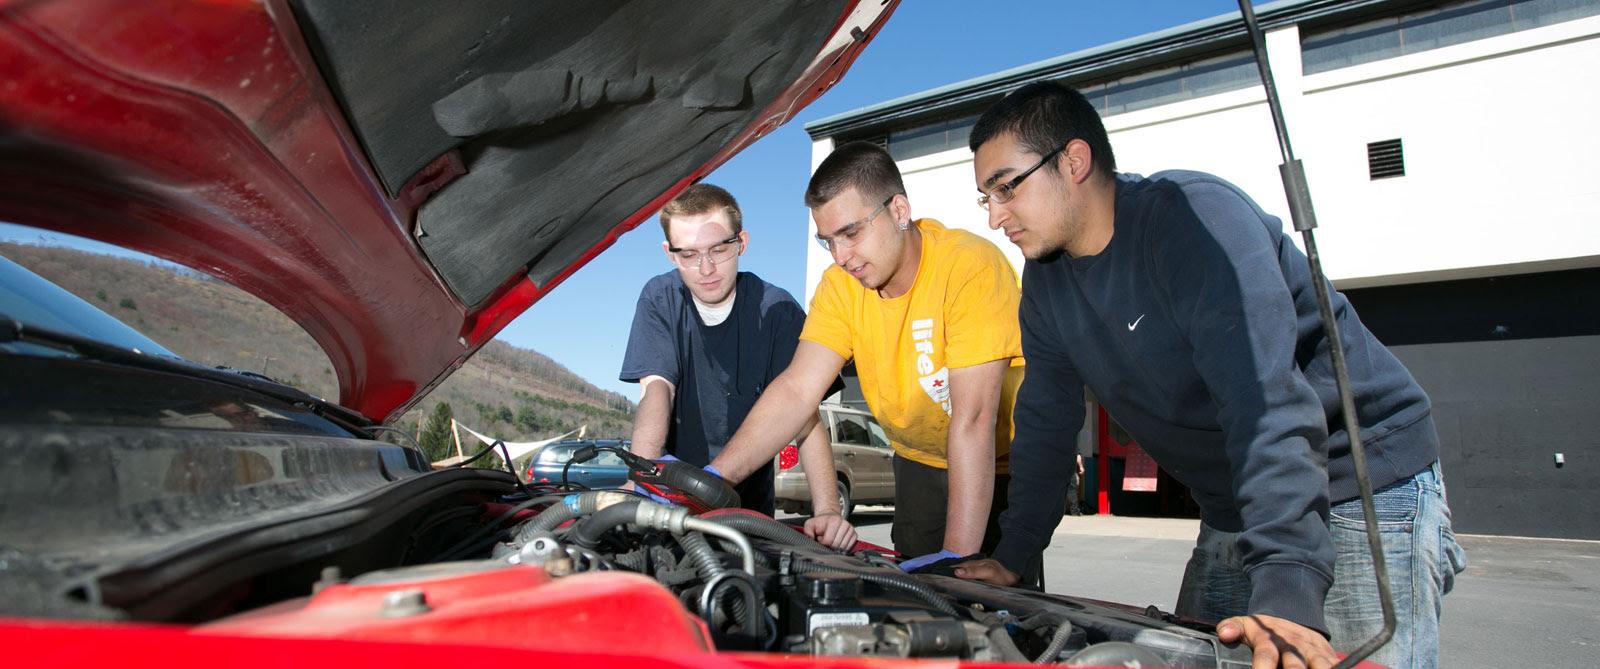 Automotive Technology AAS